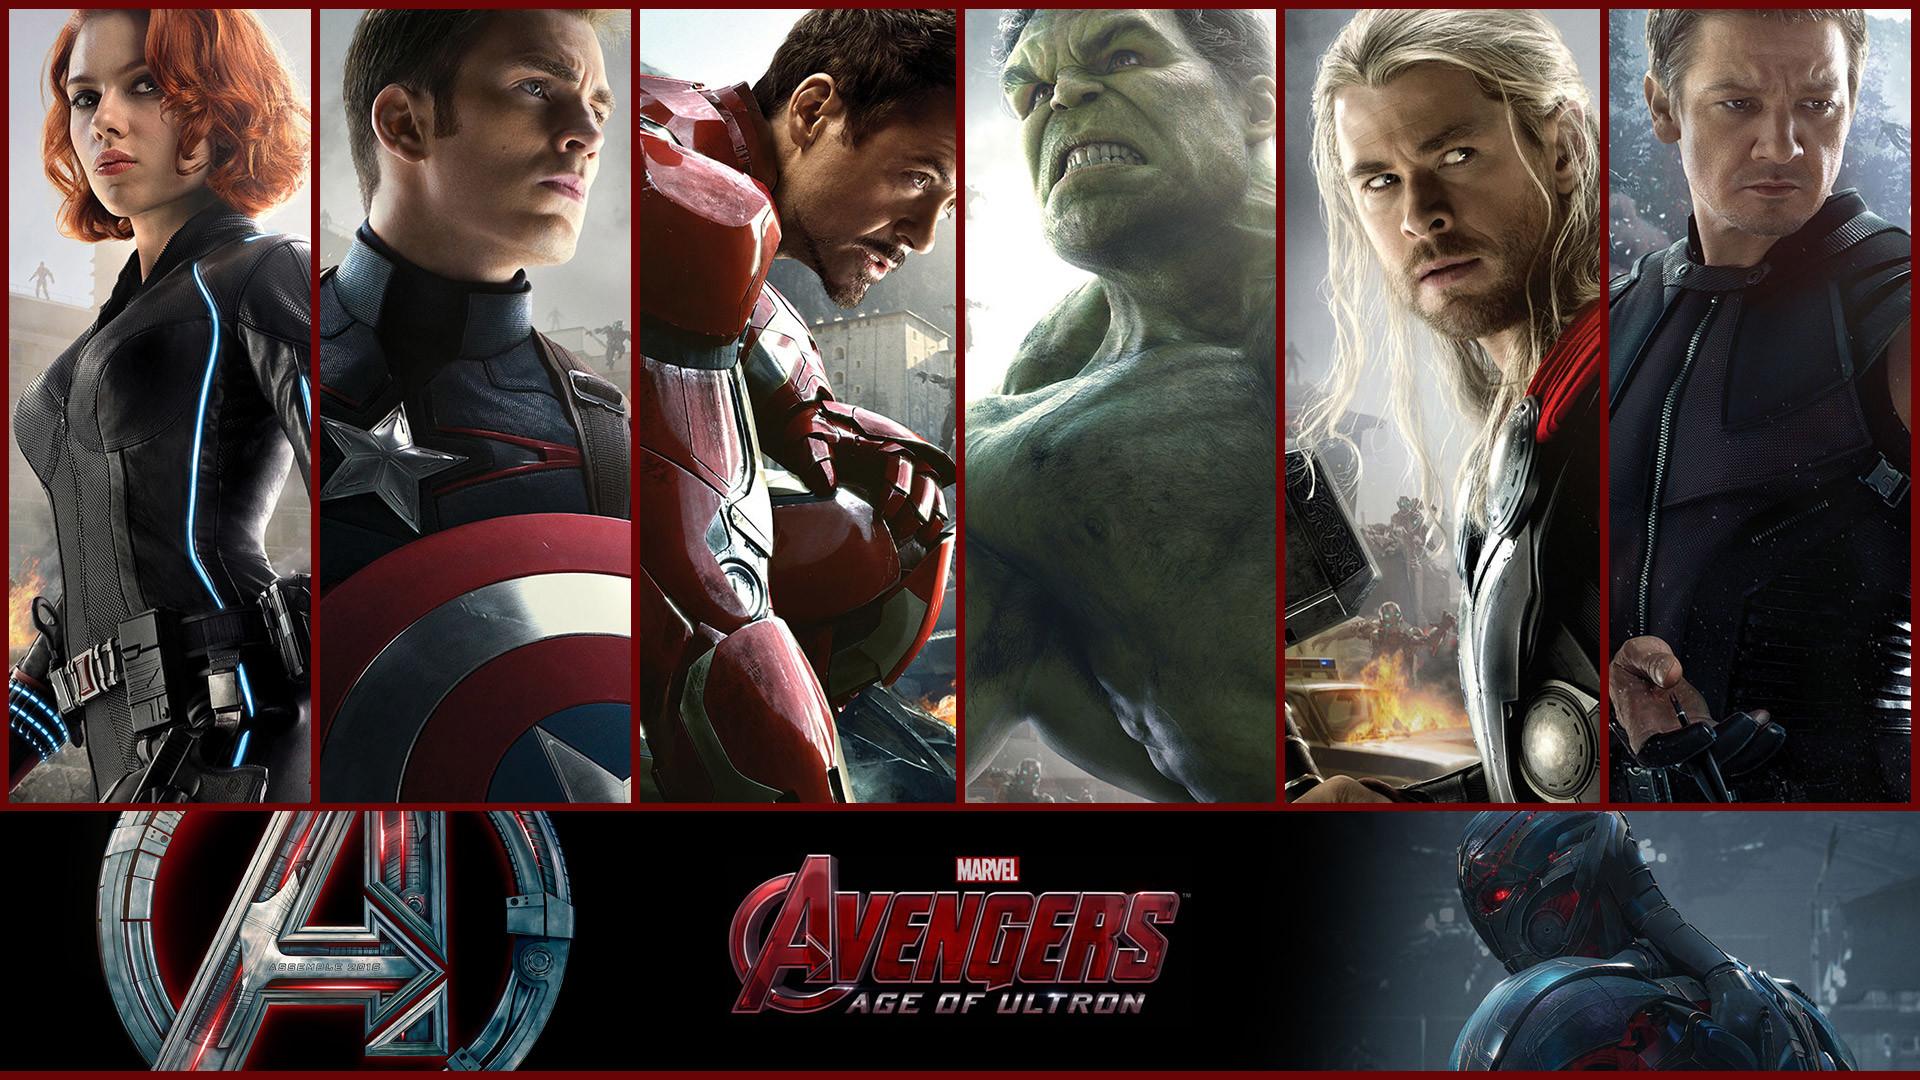 Avengers Age of Ultron 2015 Heroes Wallpaper HD